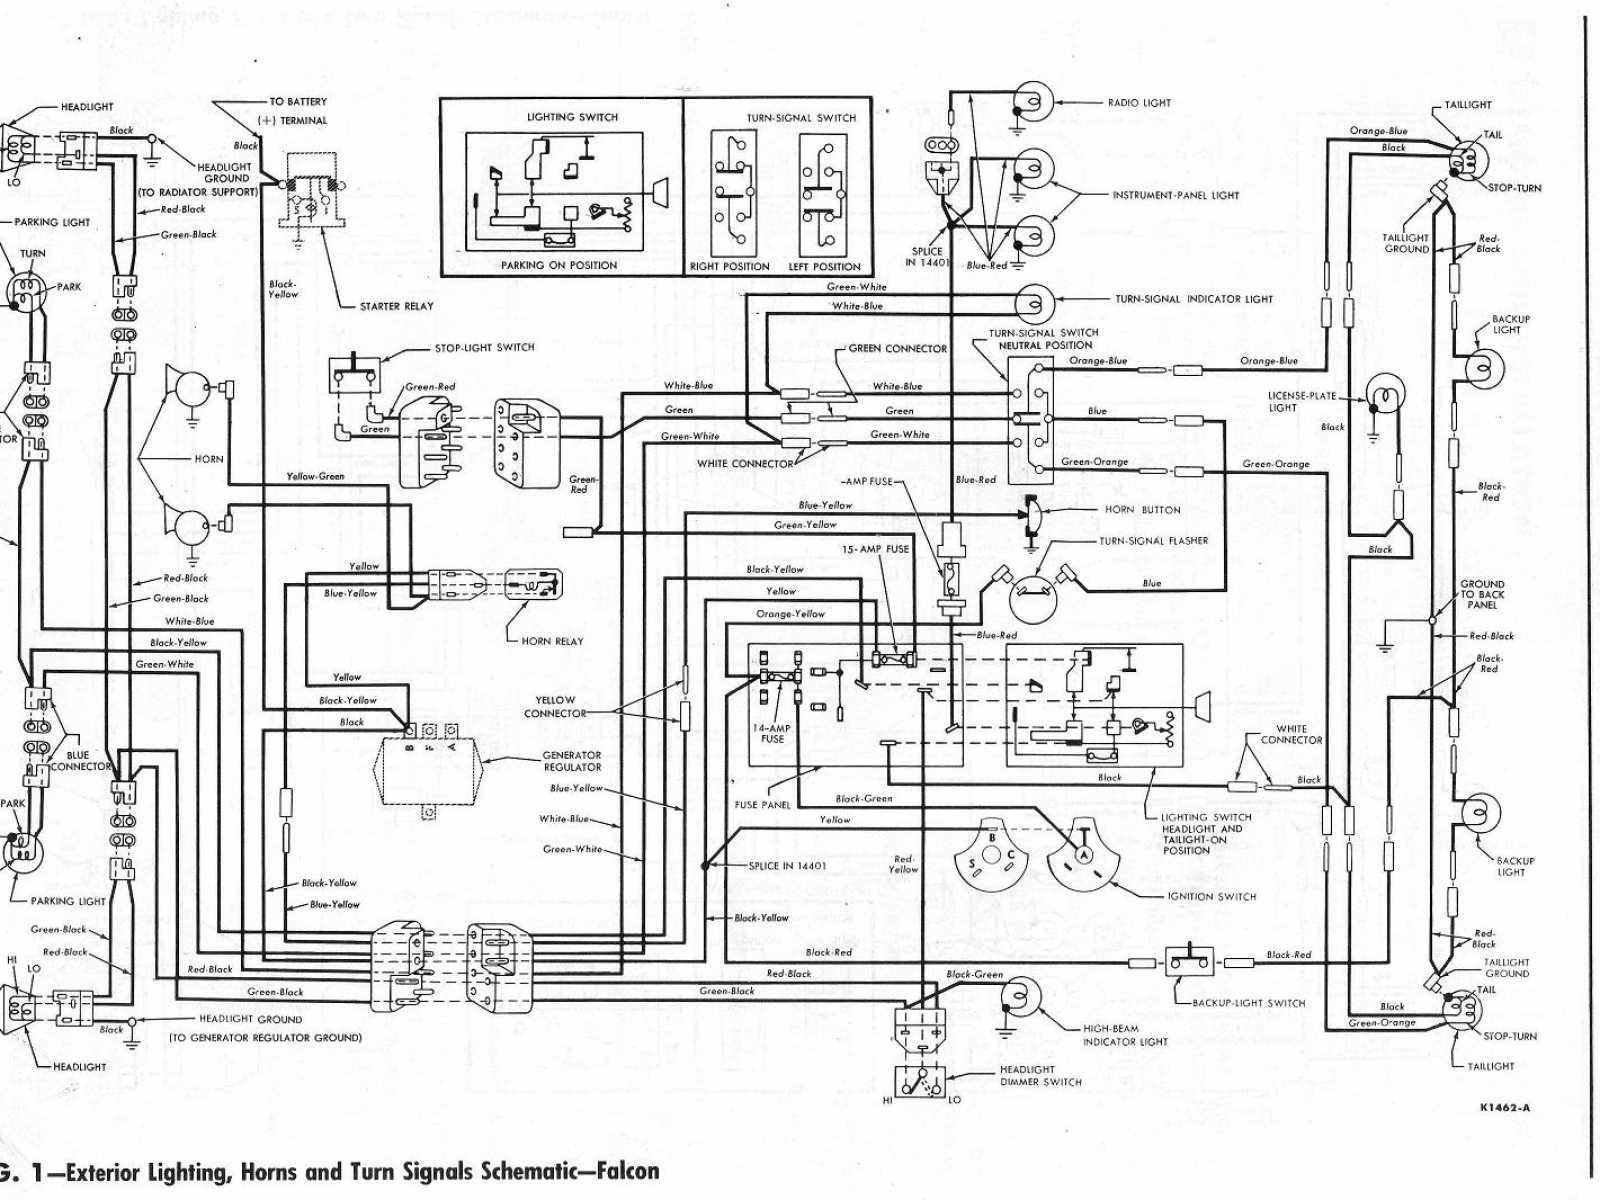 studebaker wiring harness wiring diagram expert 1948 studebaker wiring harness studebaker wiring harness [ 1600 x 1200 Pixel ]